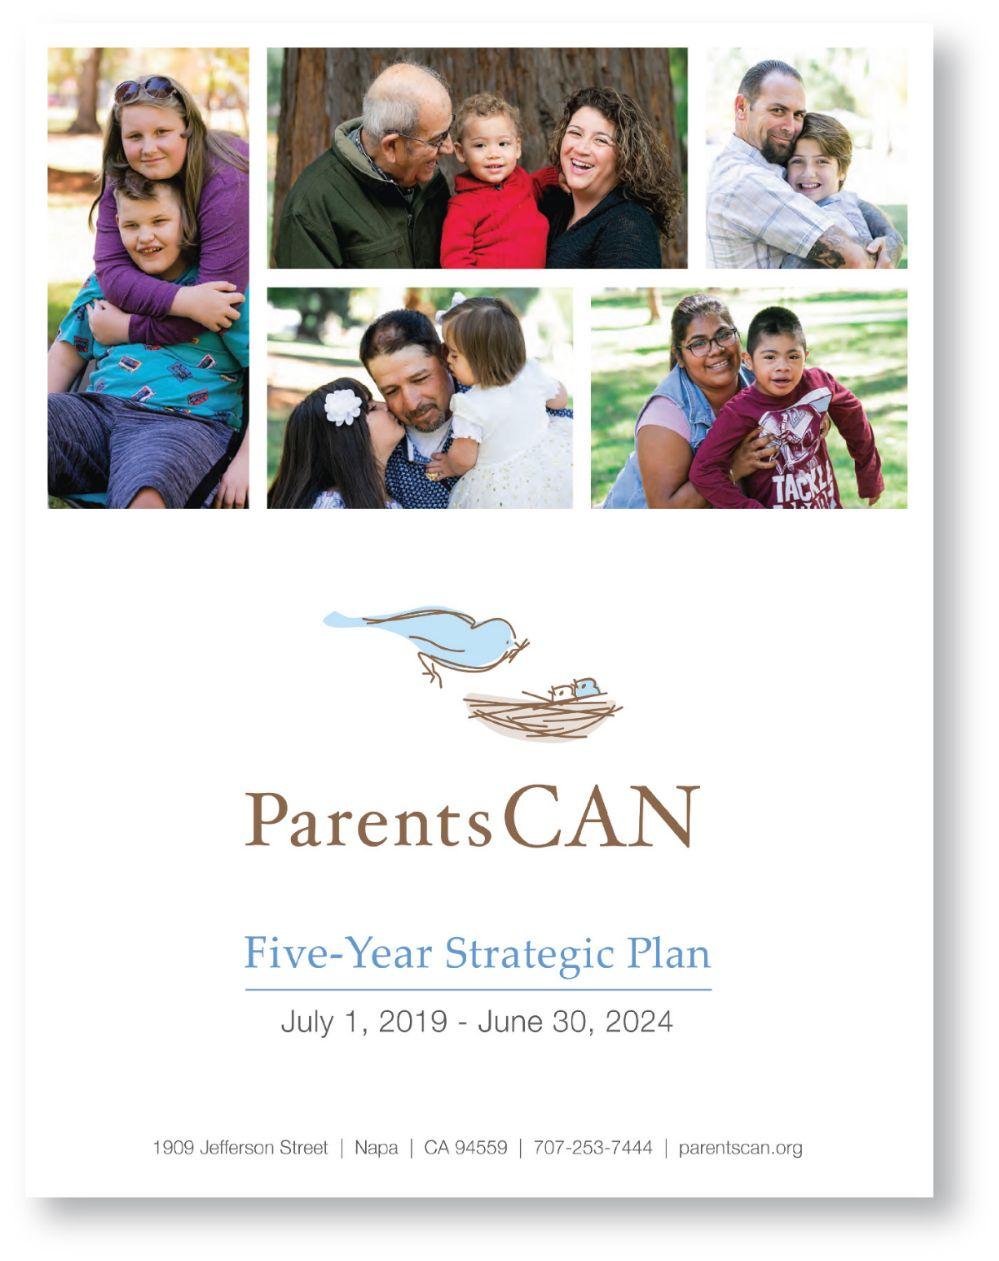 ParentsCAN Five-Year Strategic Plan